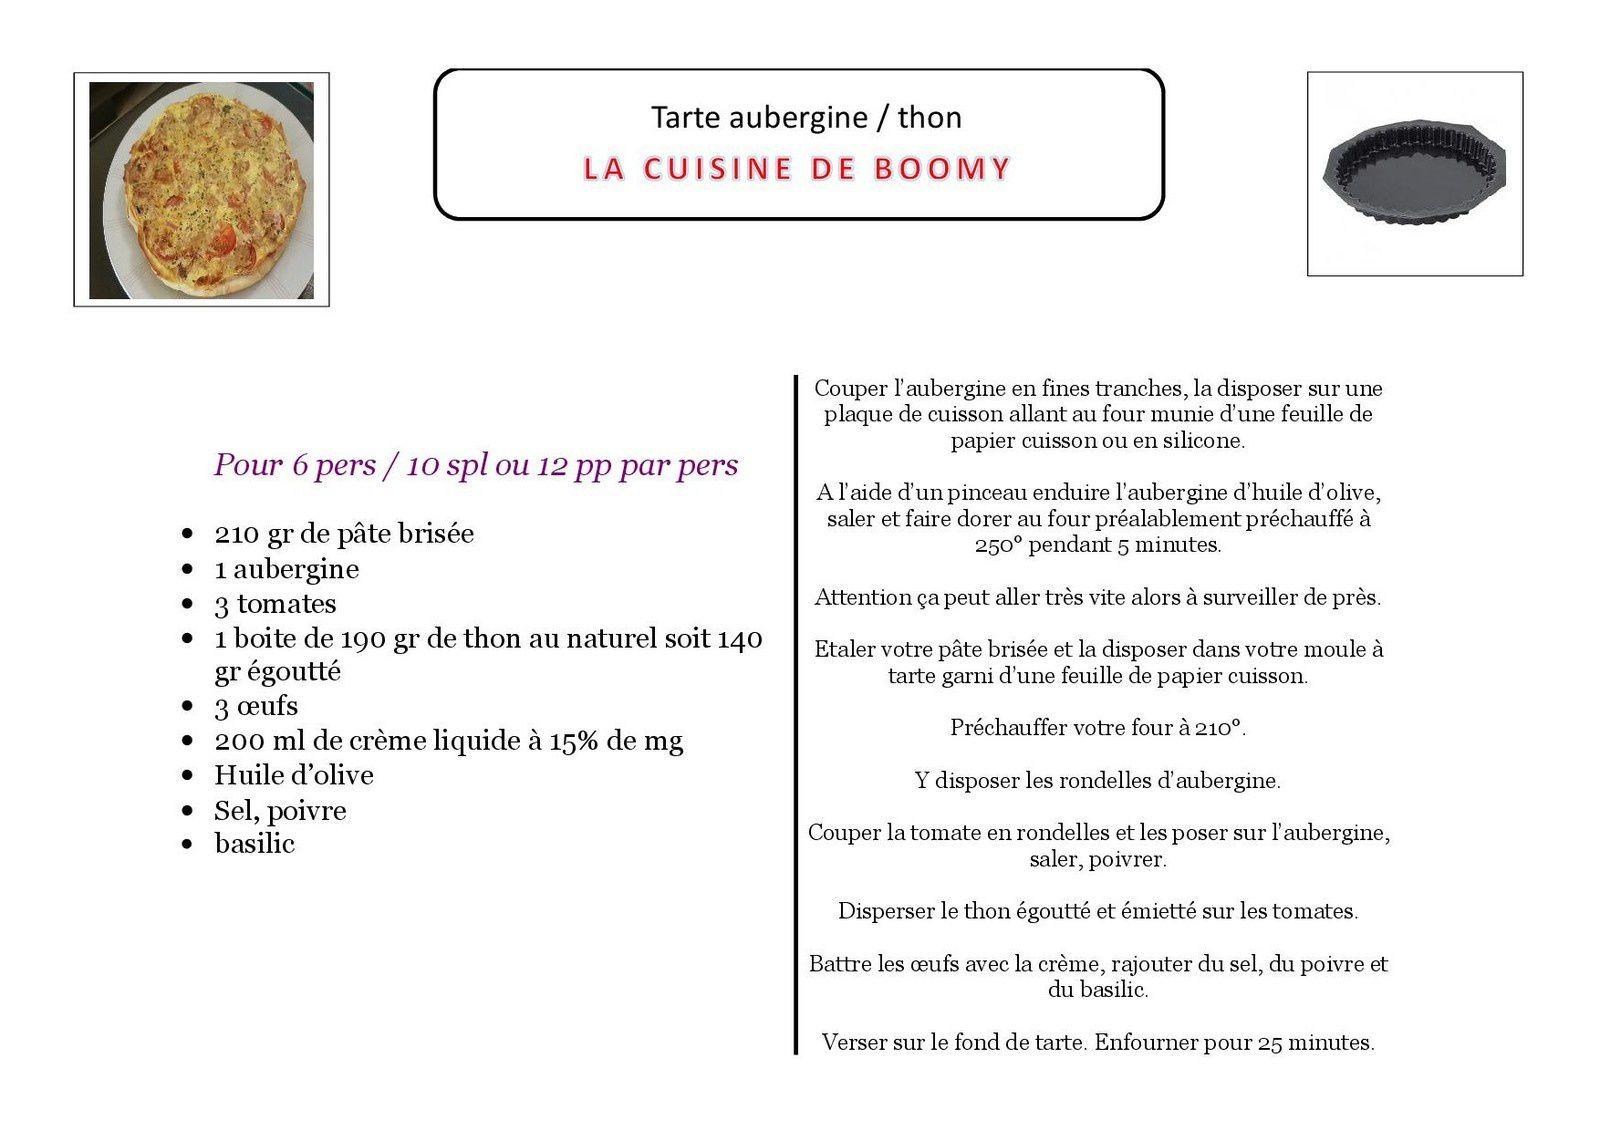 Tarte aubergine / thon